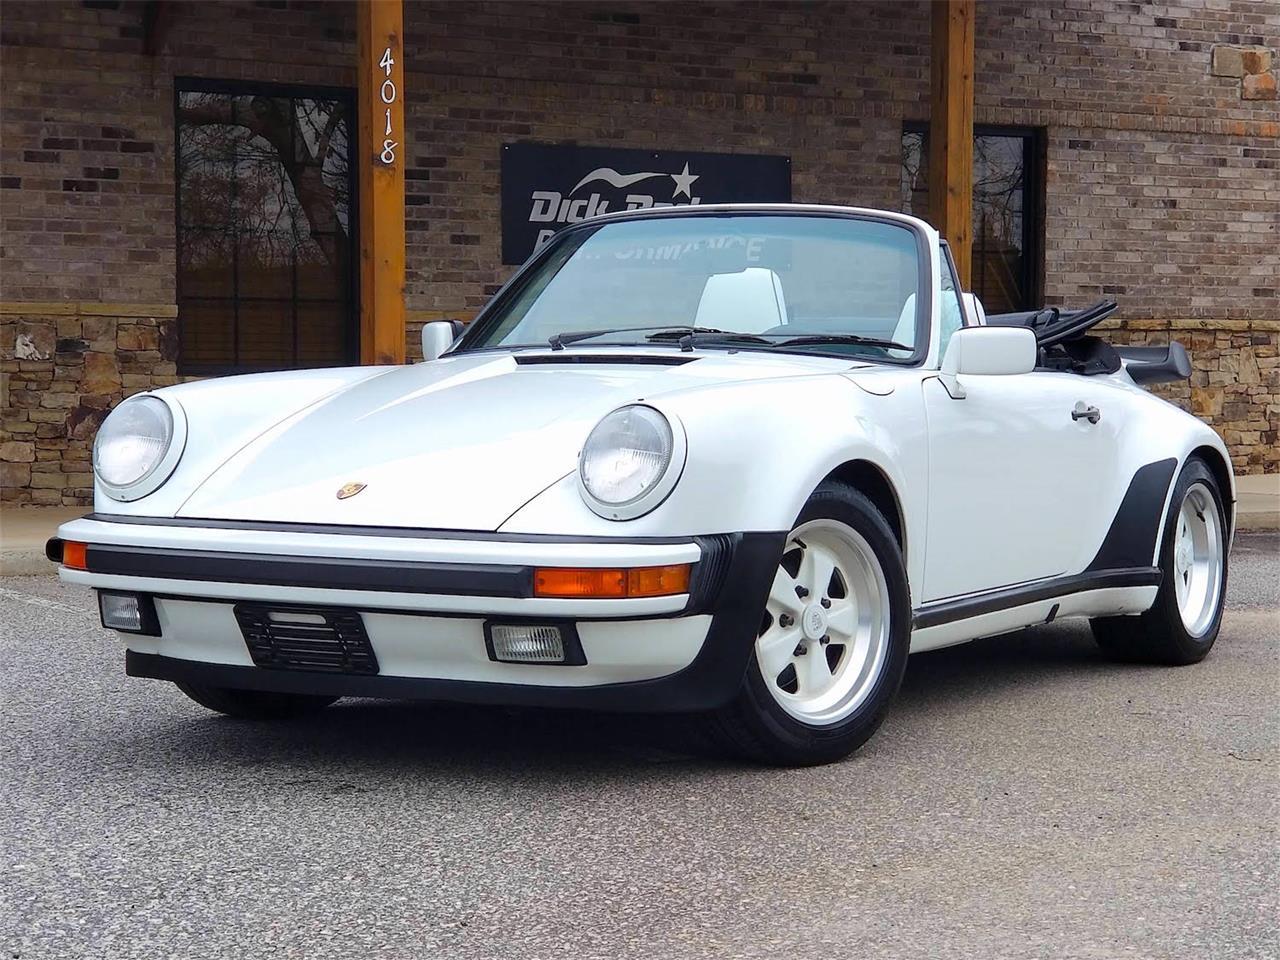 1988 Porsche 911 >> 1988 Porsche 911 Carrera For Sale Classiccars Com Cc 1204959